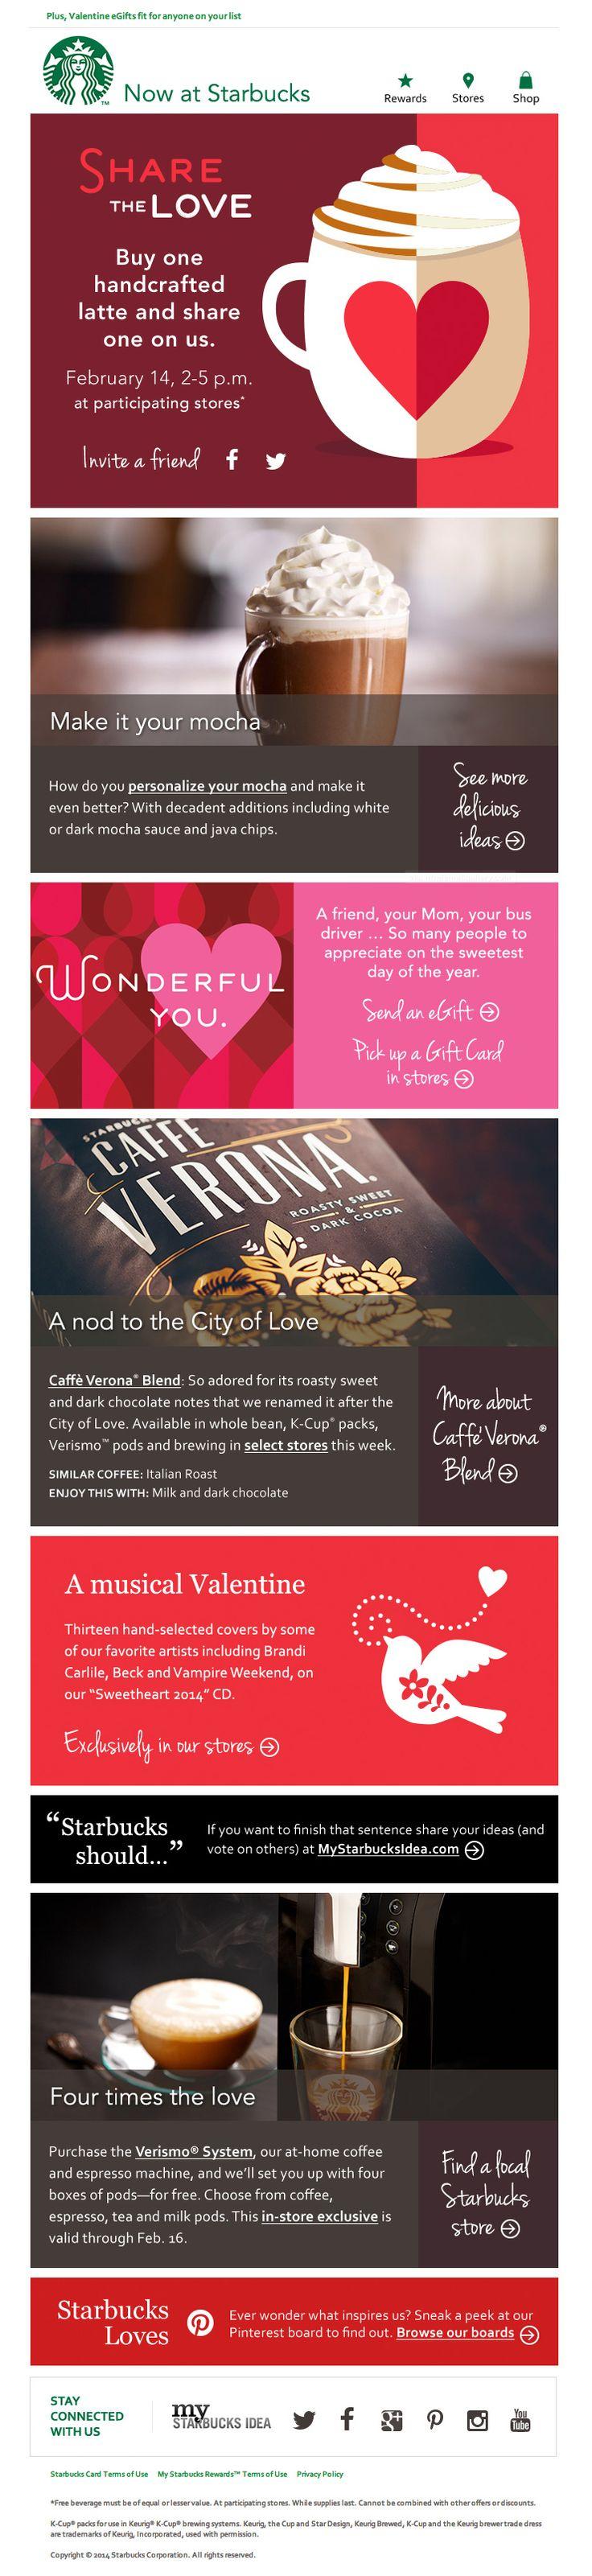 Valentine s day email marketing ideas starbucks